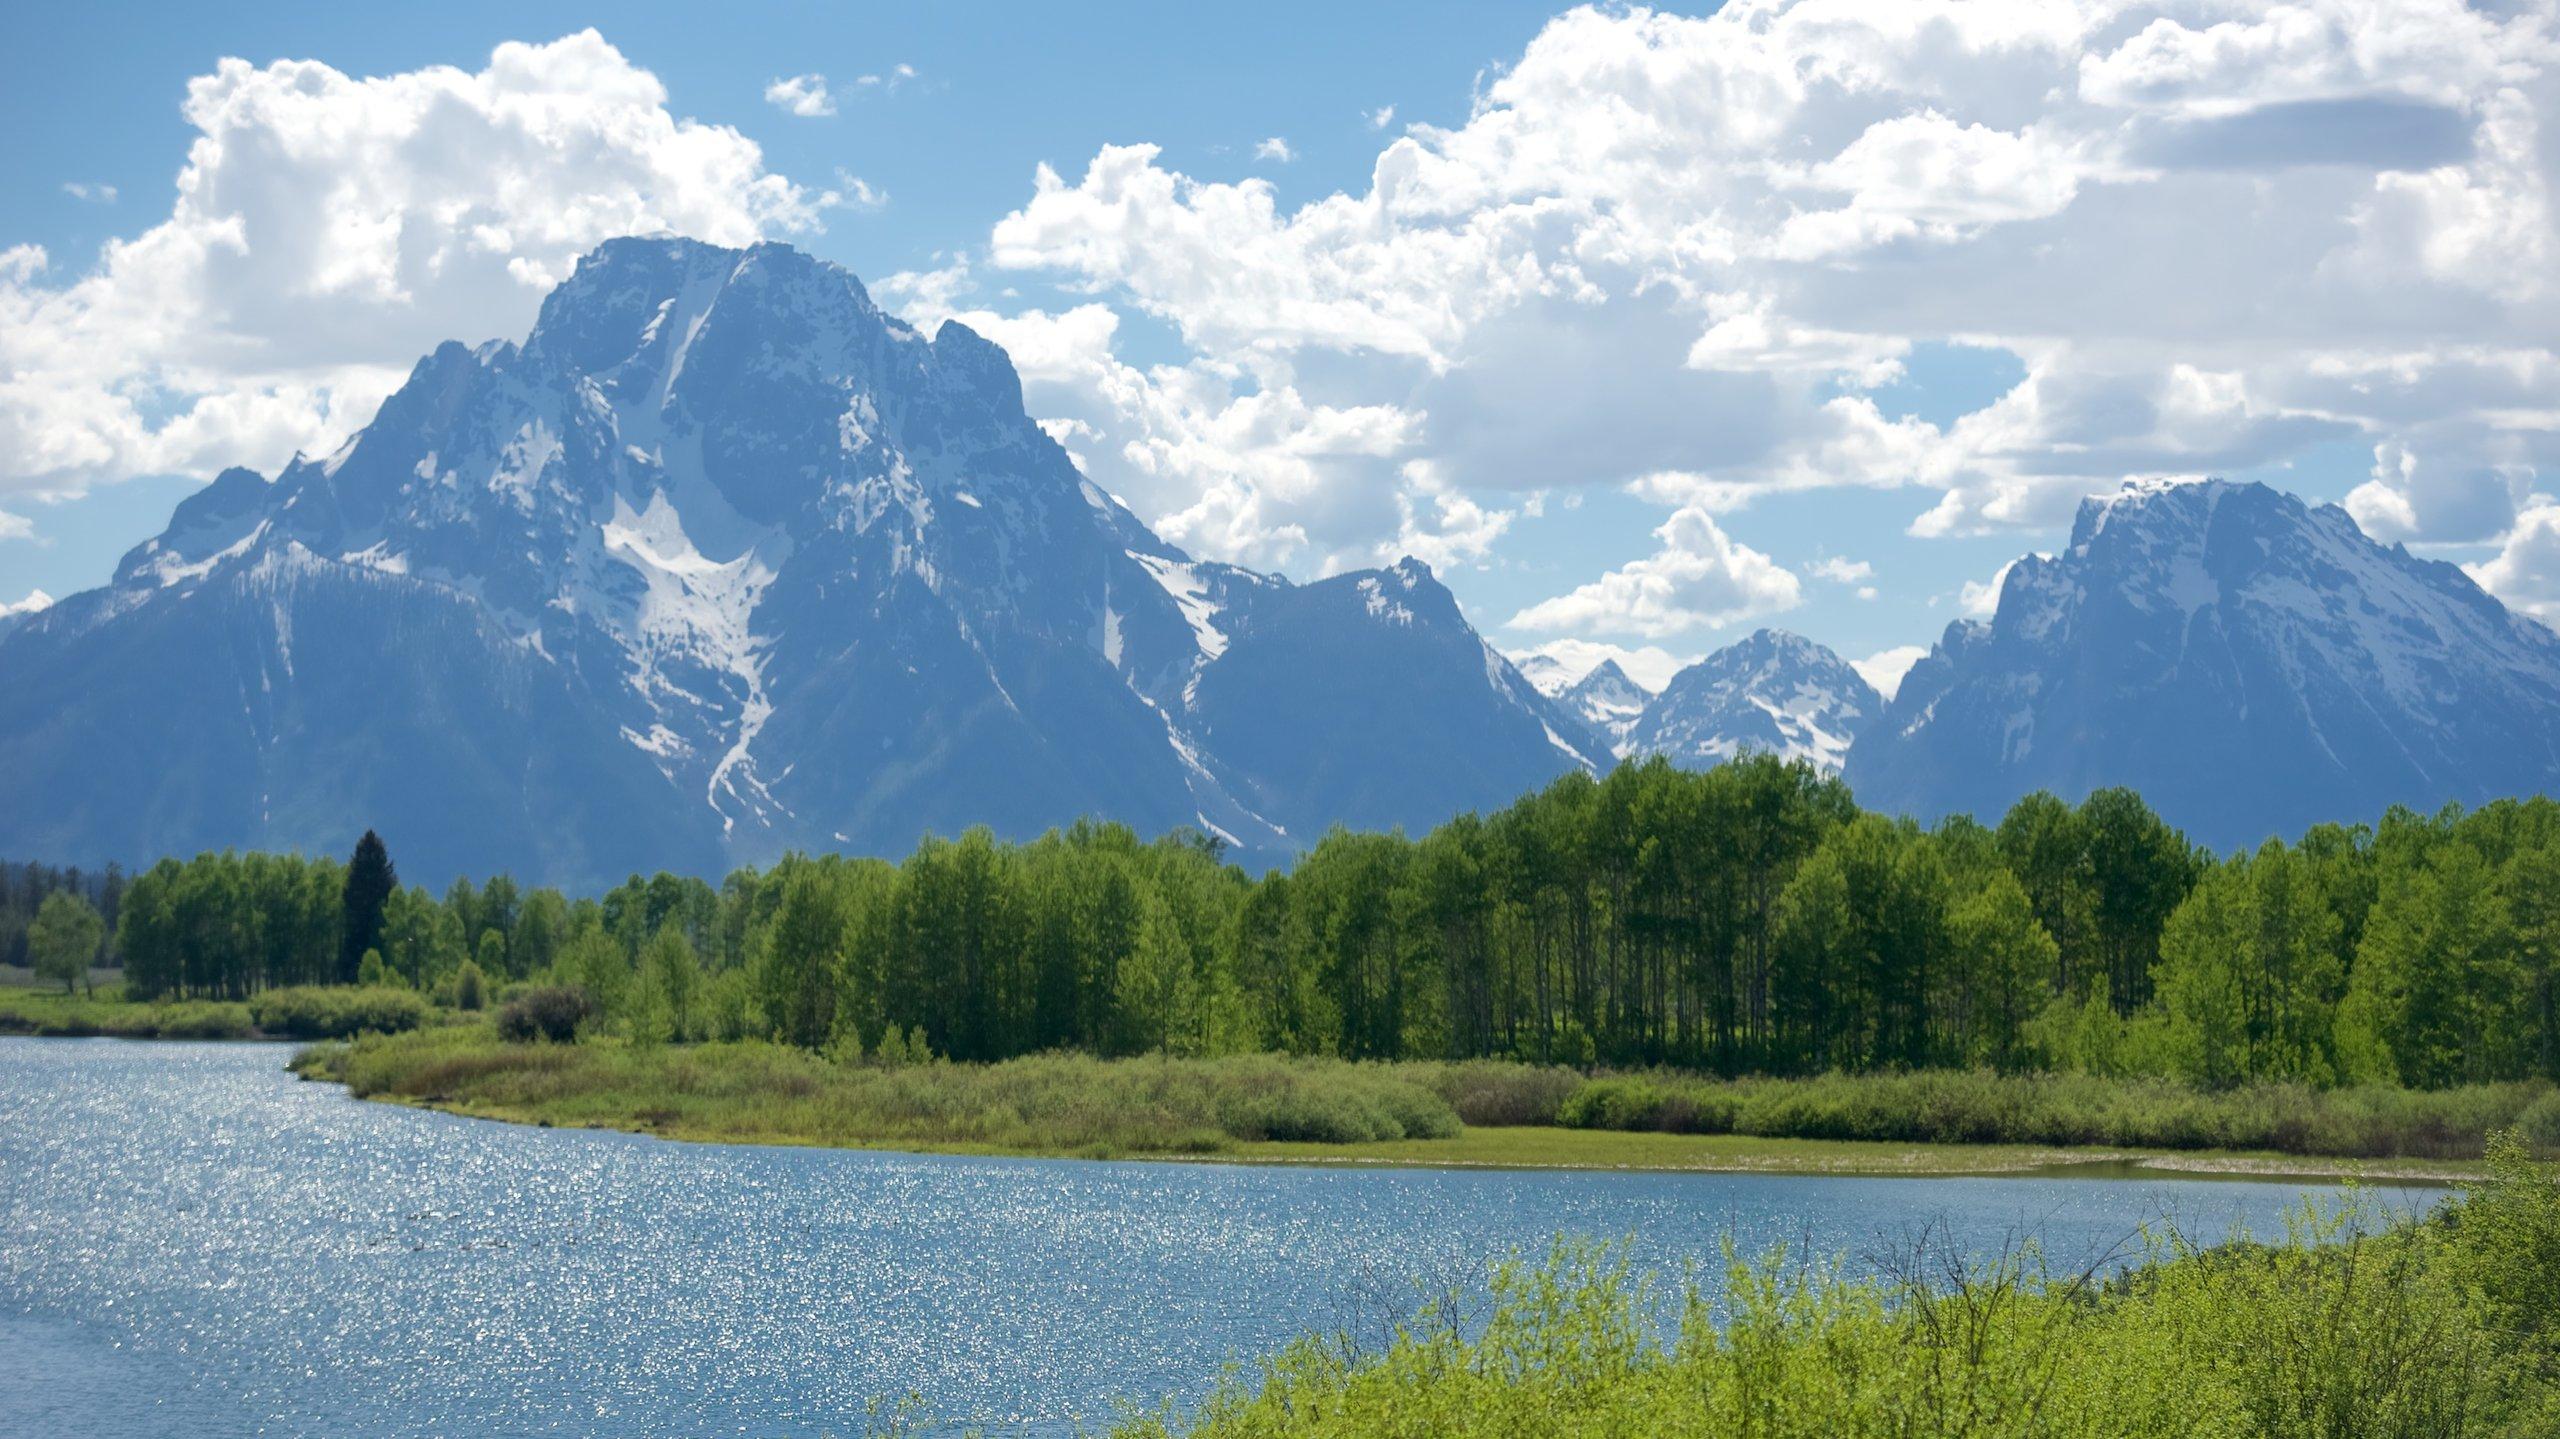 Moran, Wyoming, United States of America